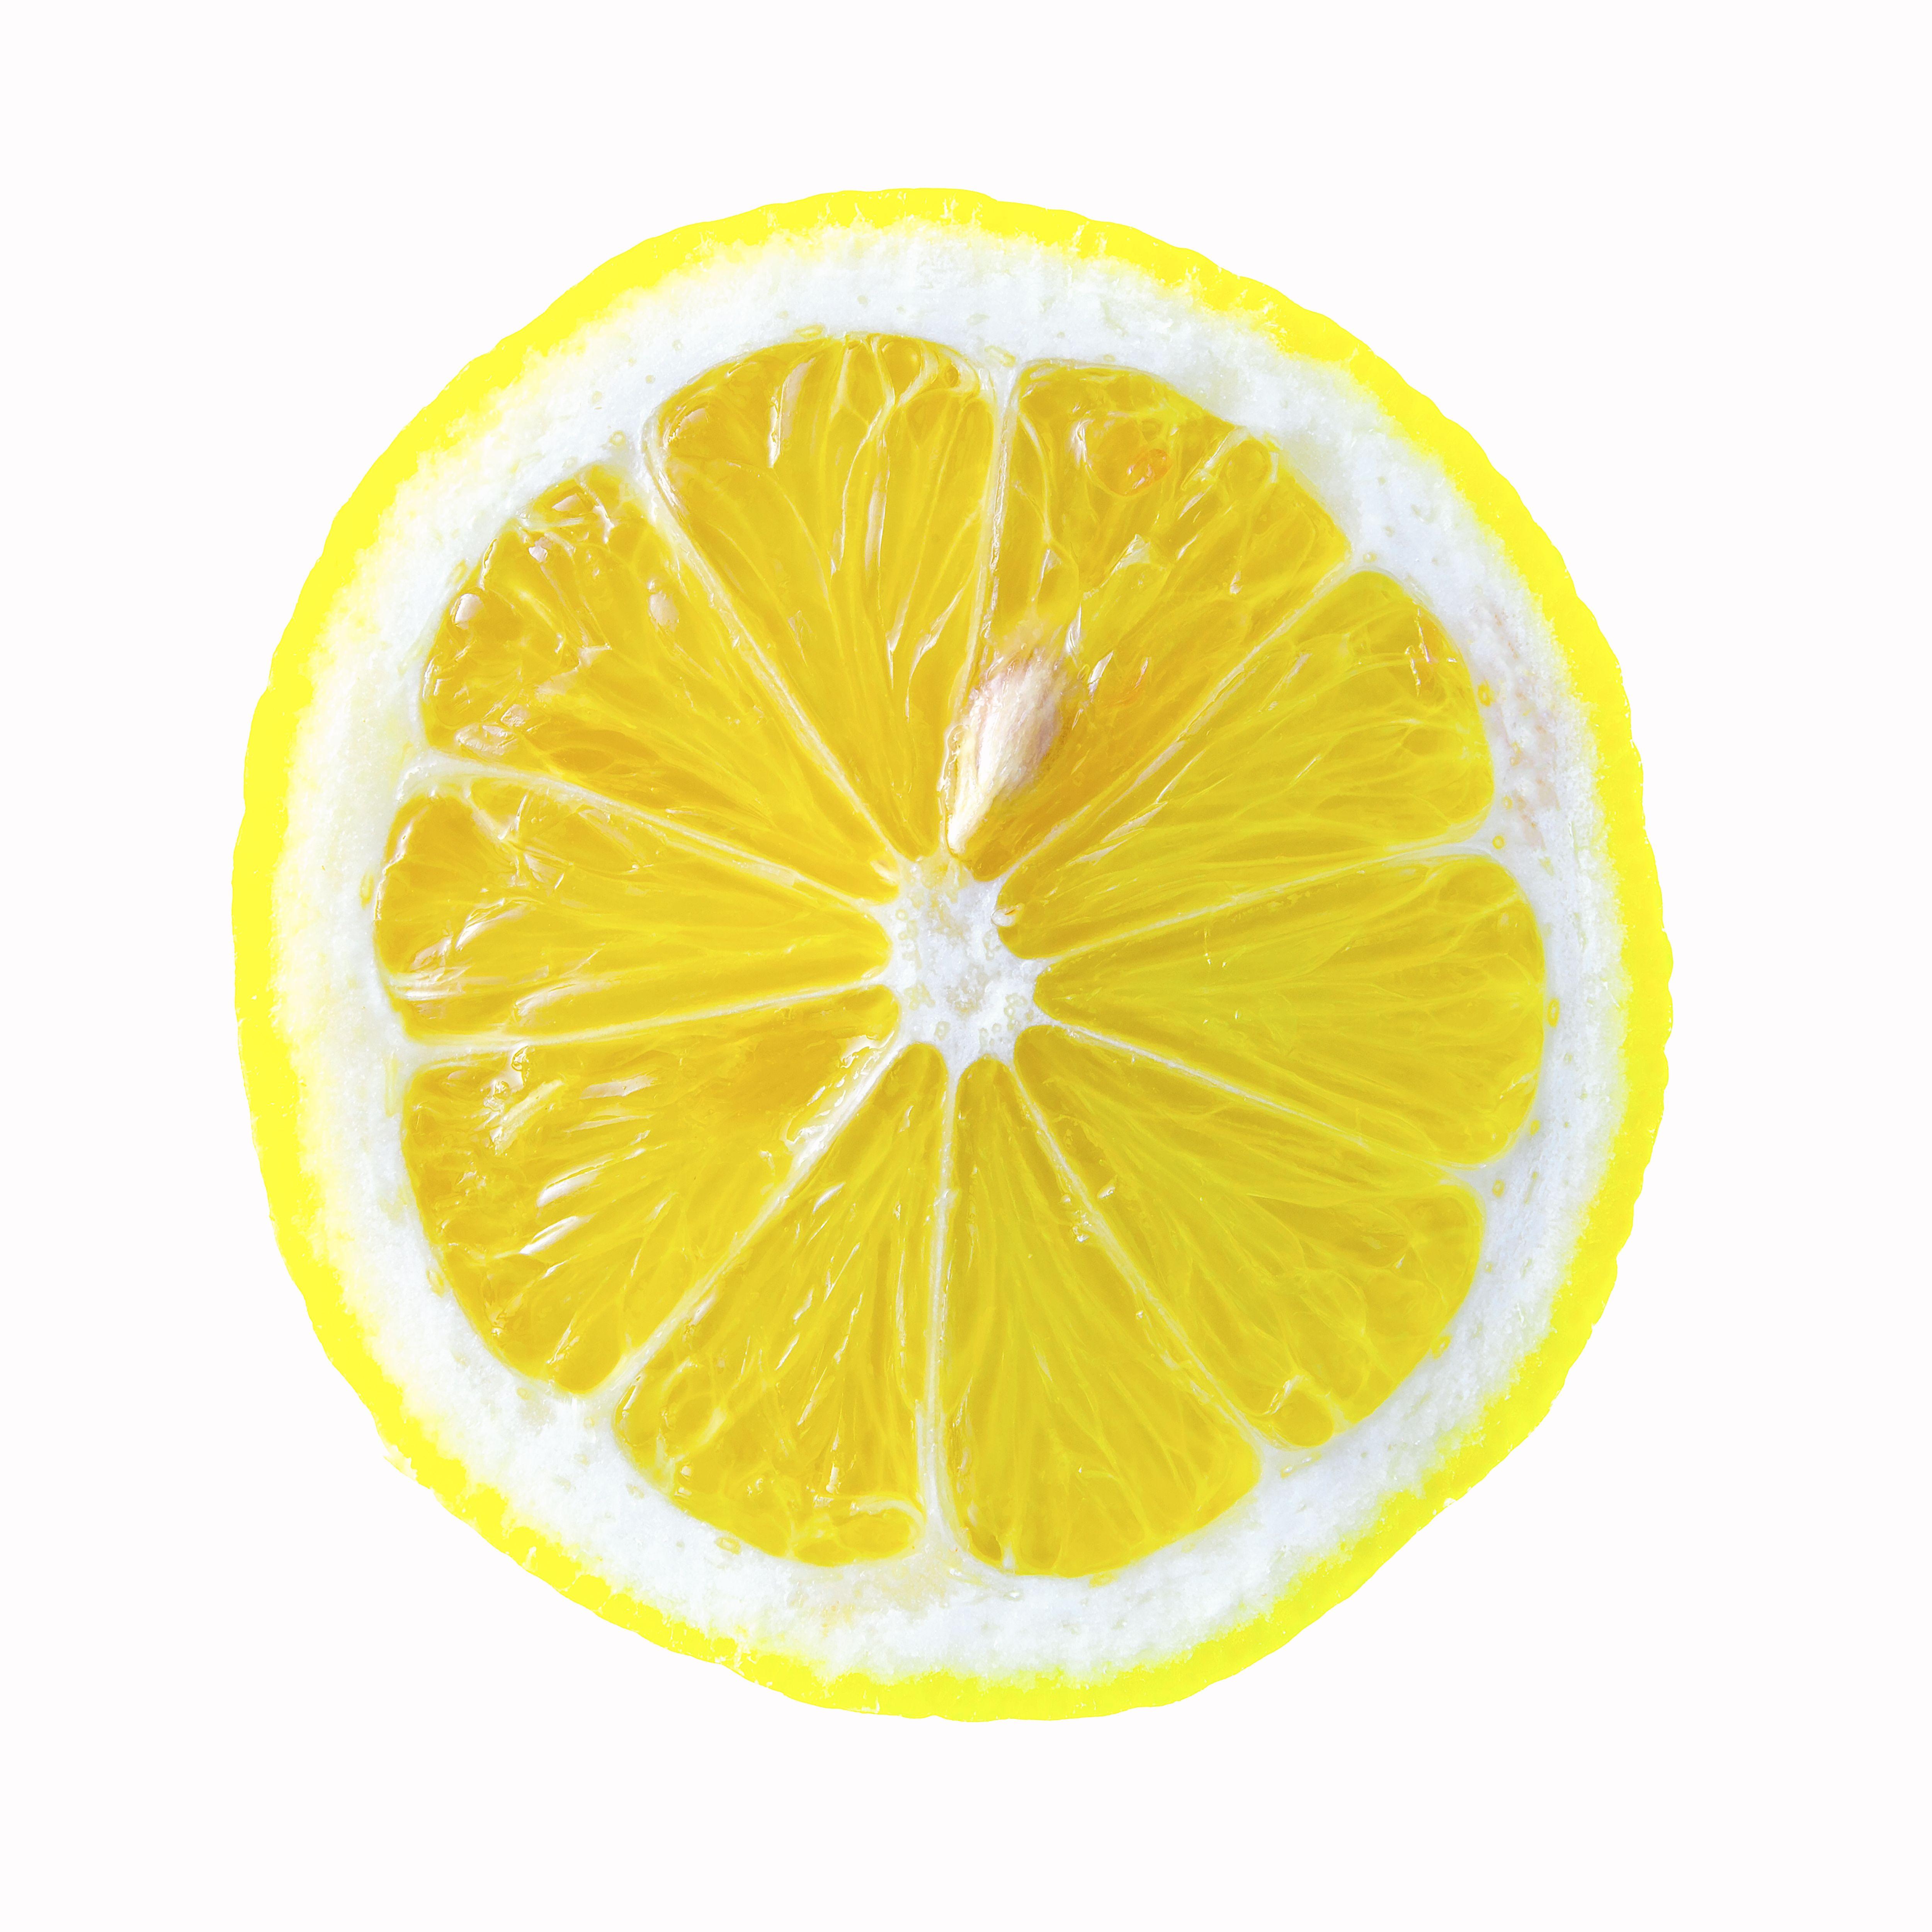 Medium Limited Edition Color Photograph Silver Hal Gelatin Lemon Lemon Art Fruit Can Dogs Eat Oranges